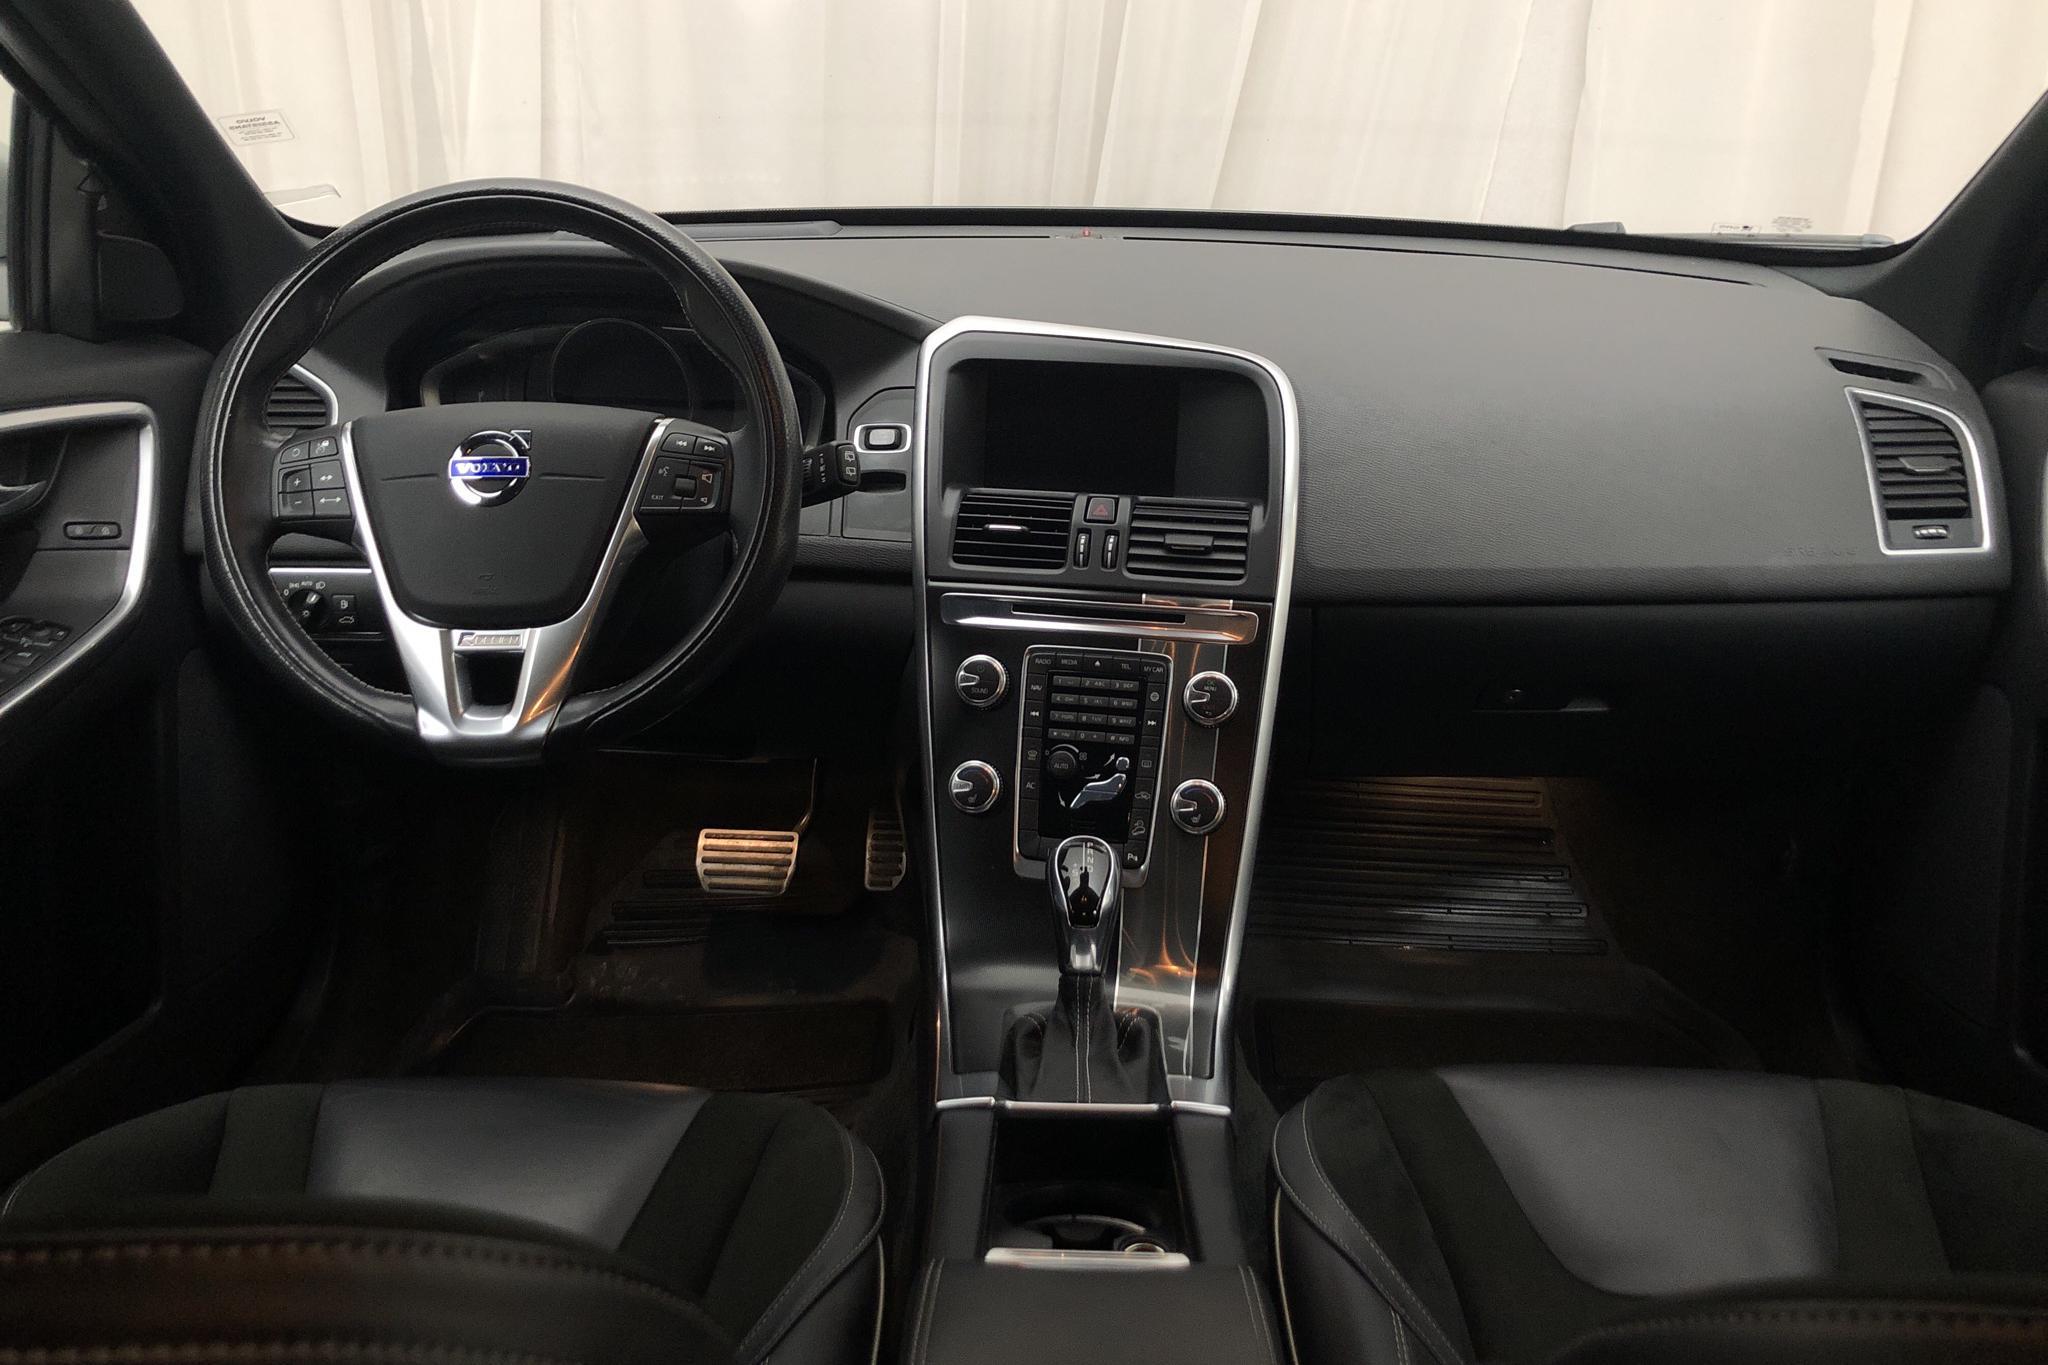 Volvo XC60 D4 AWD (190hk) - 8 391 mil - Automat - svart - 2016